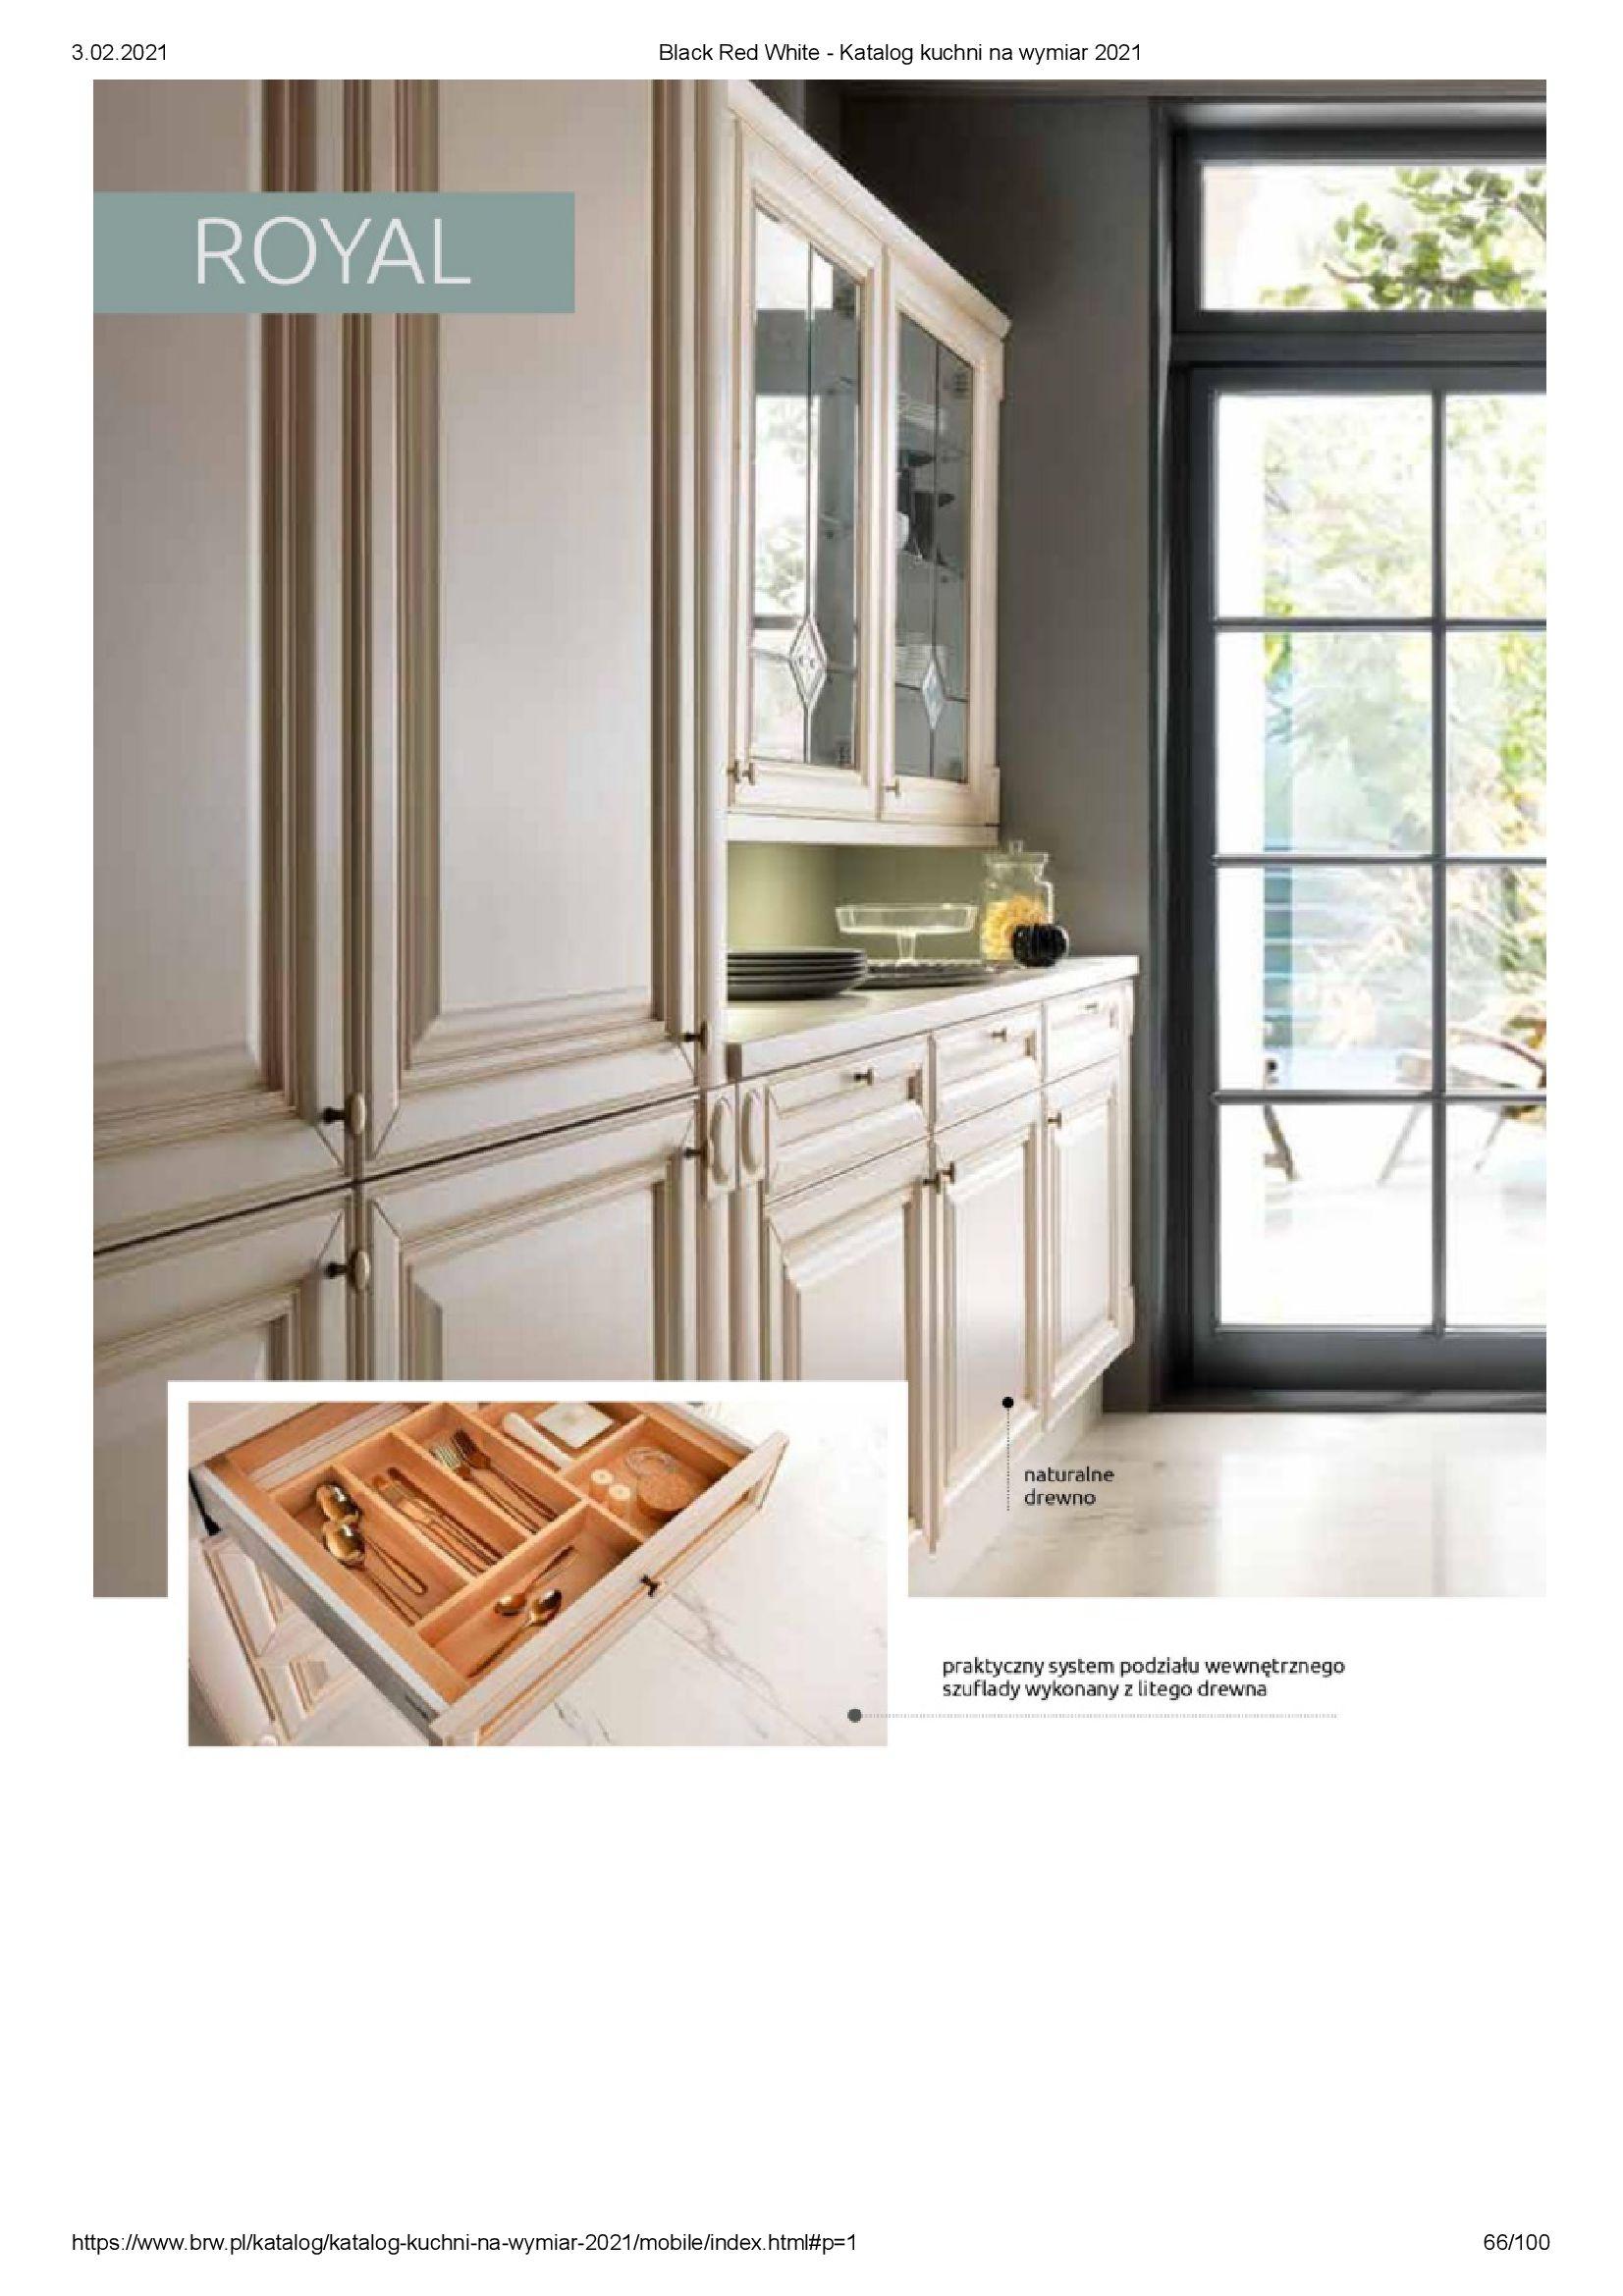 Gazetka Black Red White: Katalog - Kuchnie na wymiar Senso Kitchens 2021 2021-01-01 page-66